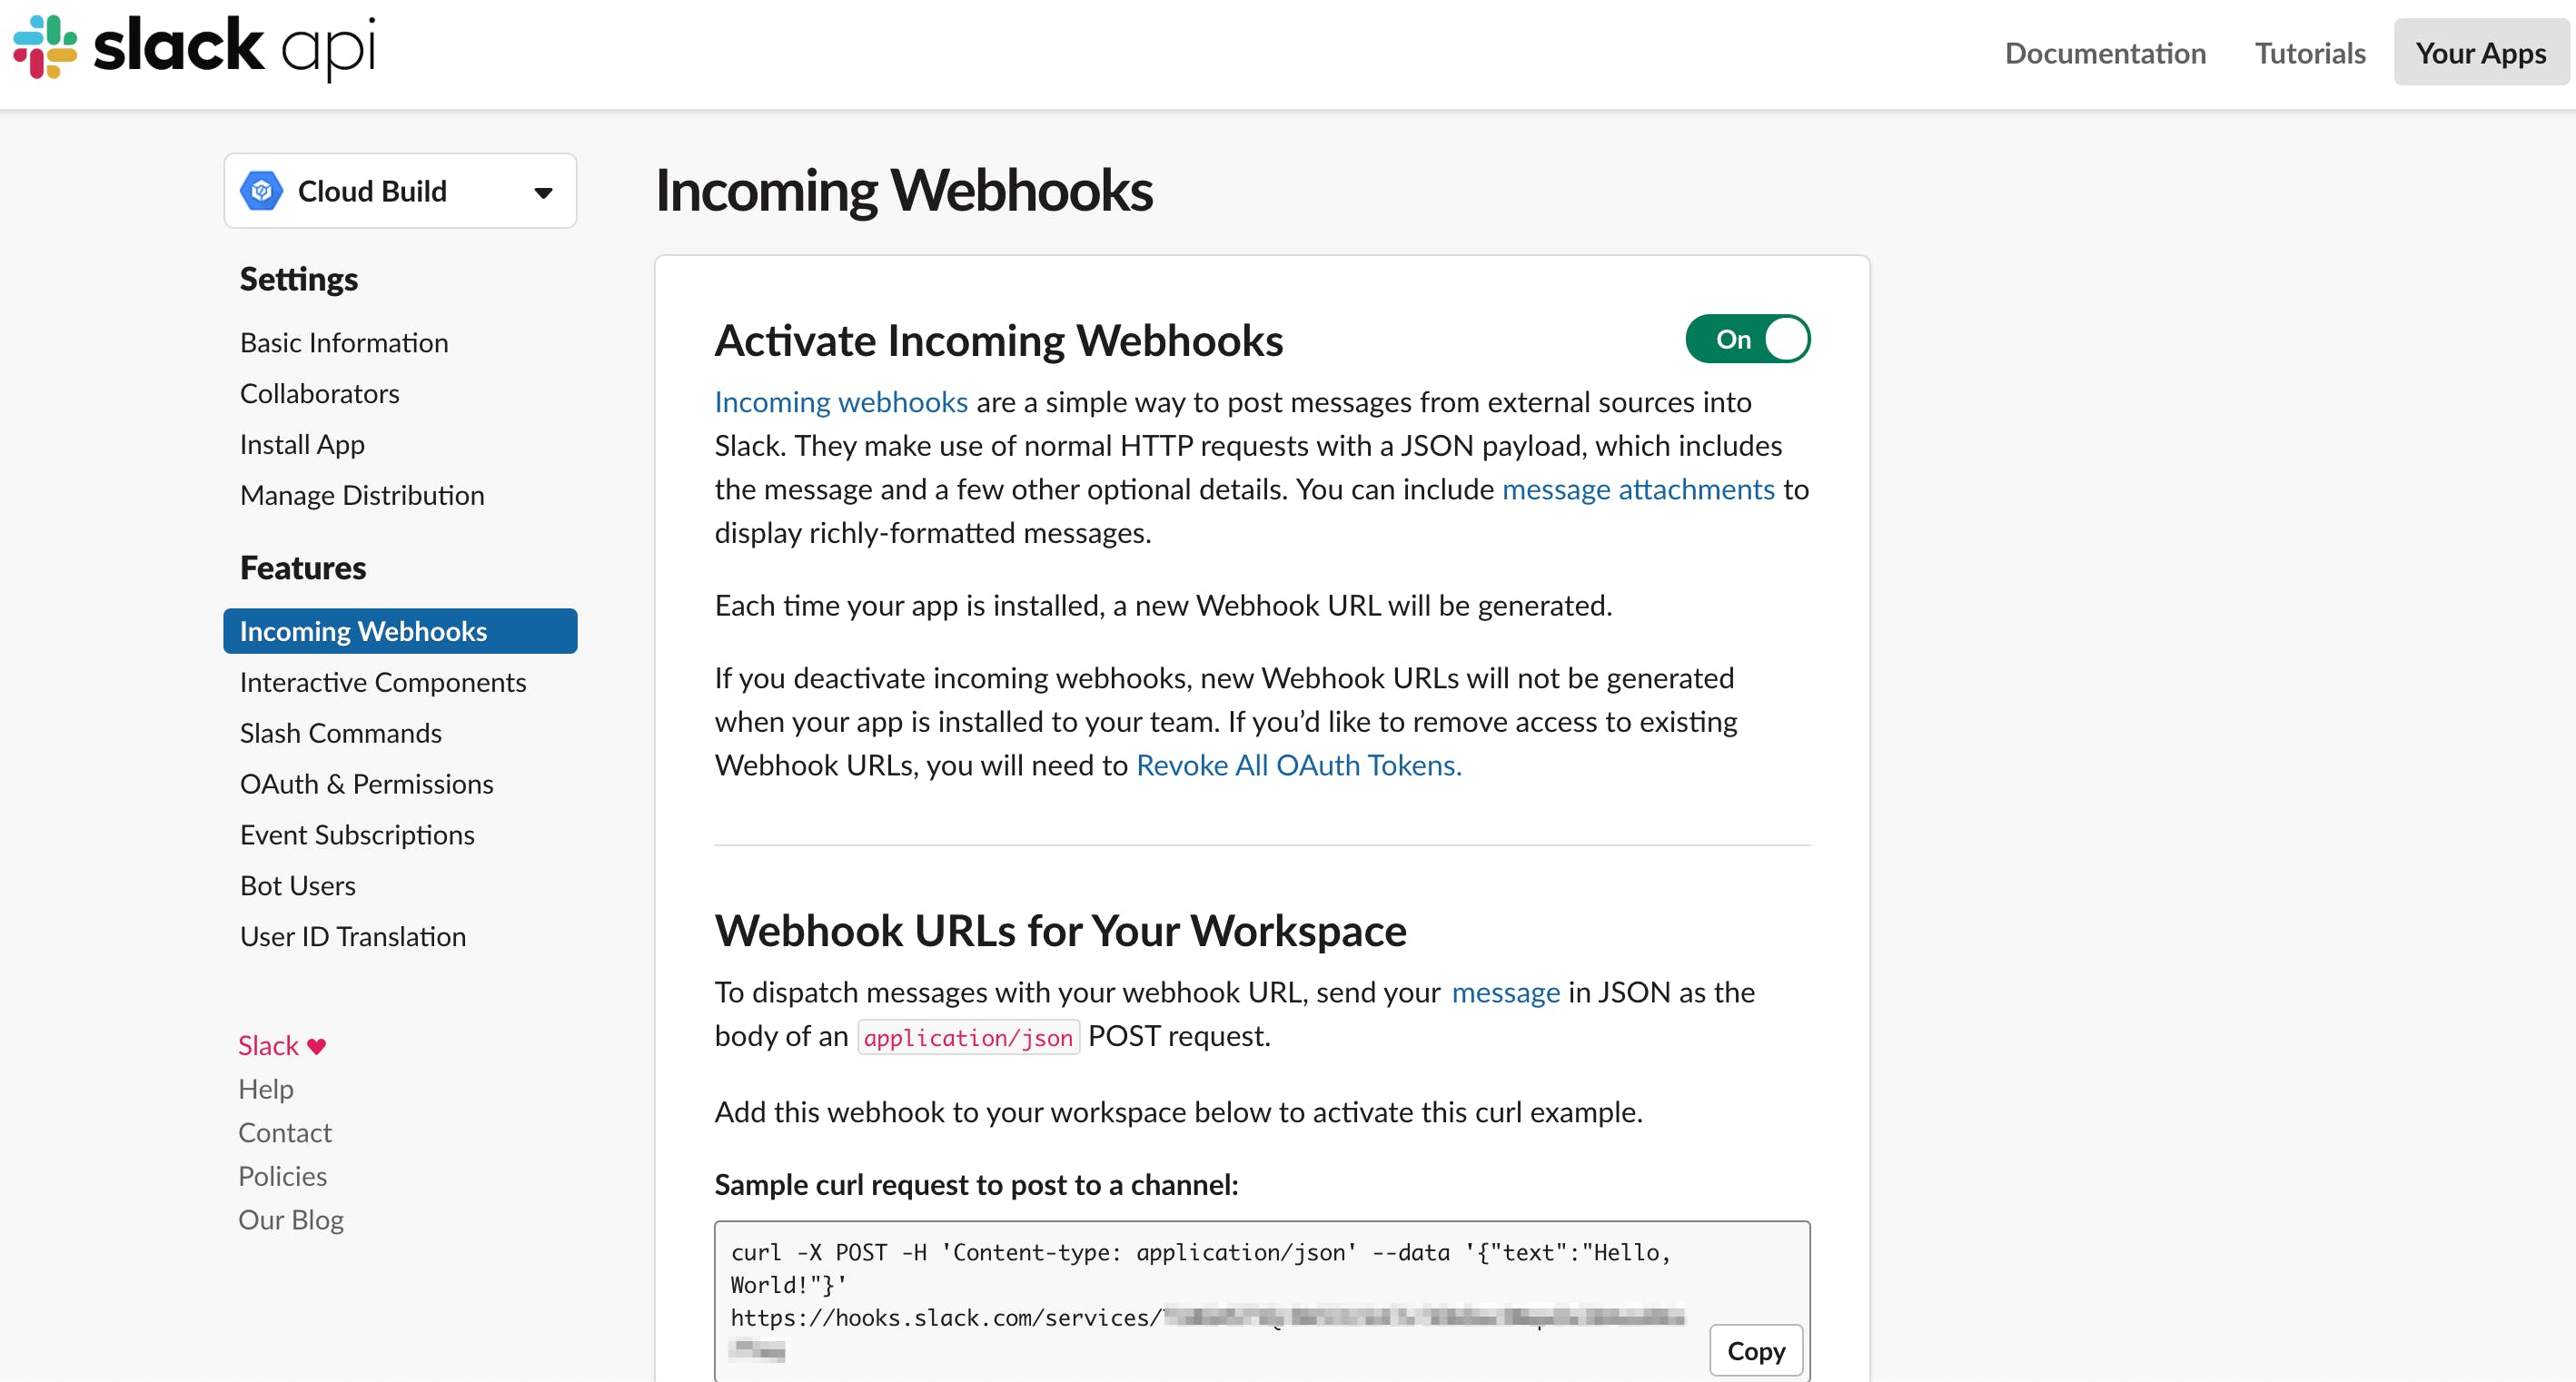 Slack_API__Applications___VISITS_Slack.png